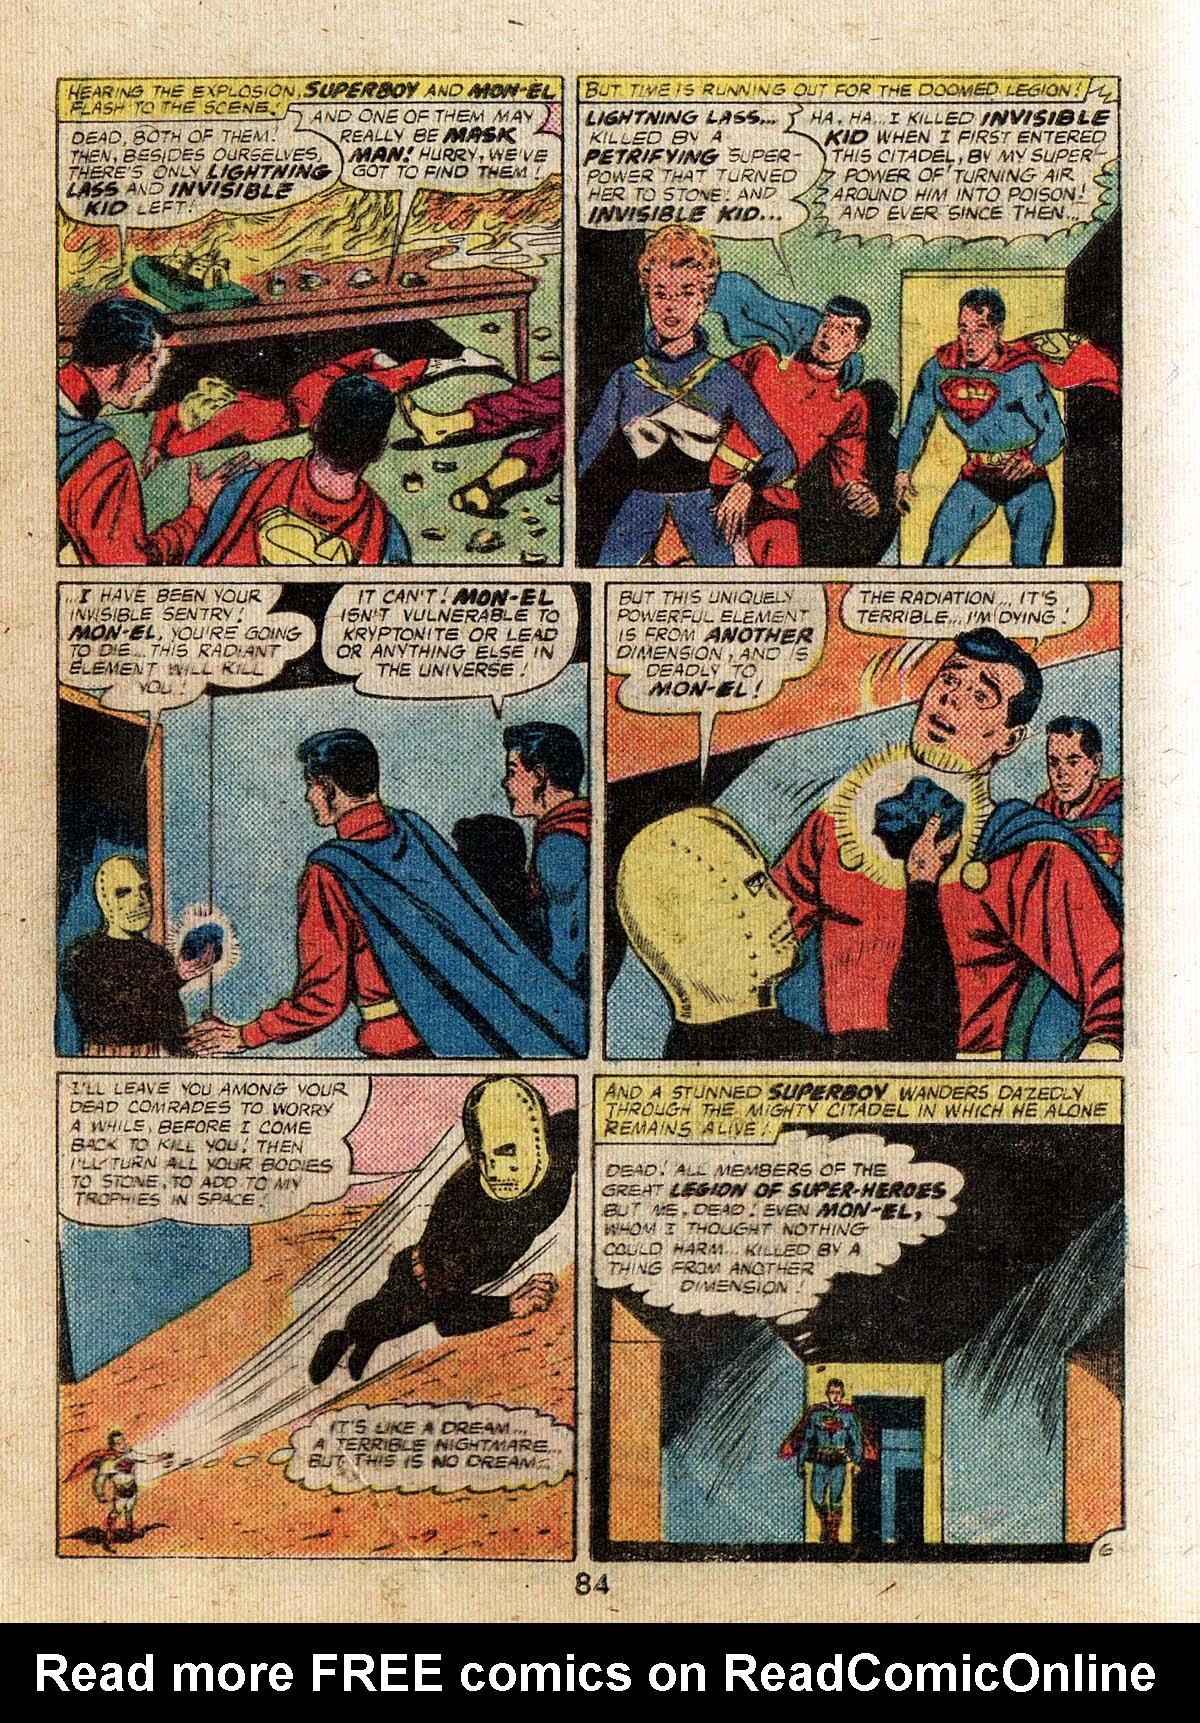 Read online Adventure Comics (1938) comic -  Issue #500 - 84